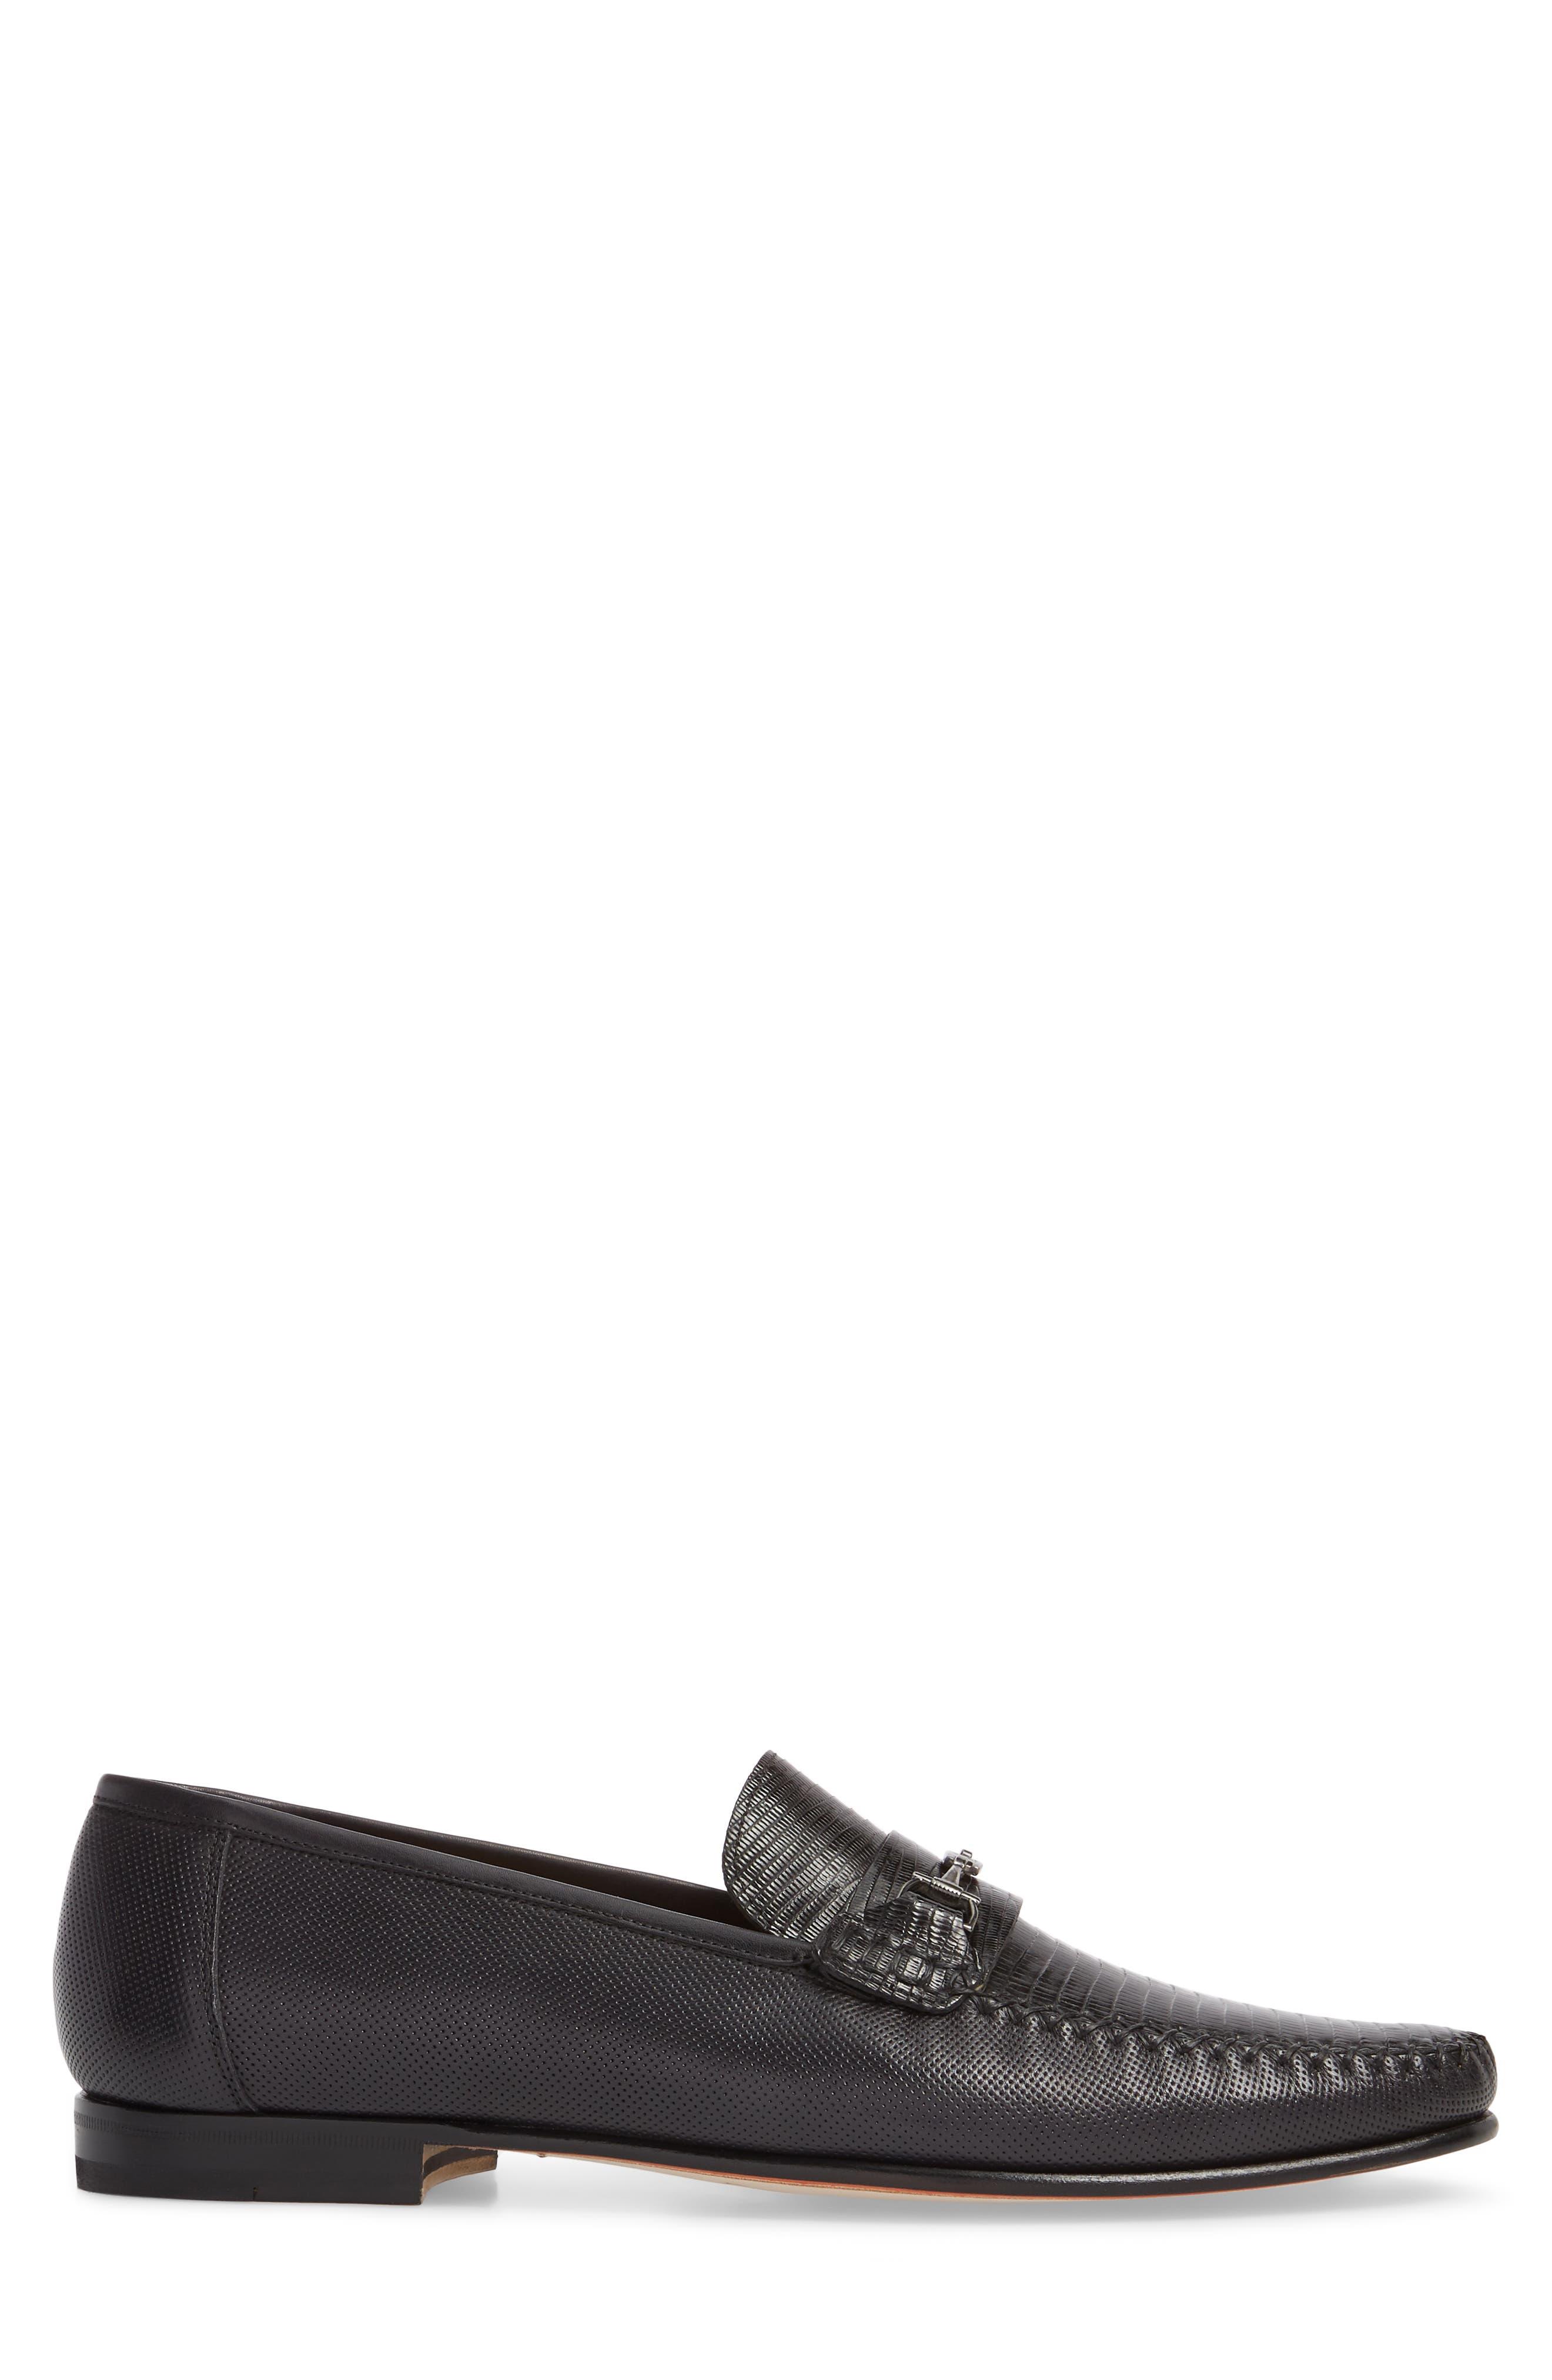 Sileno Lizard Loafer,                             Alternate thumbnail 3, color,                             Black Leather